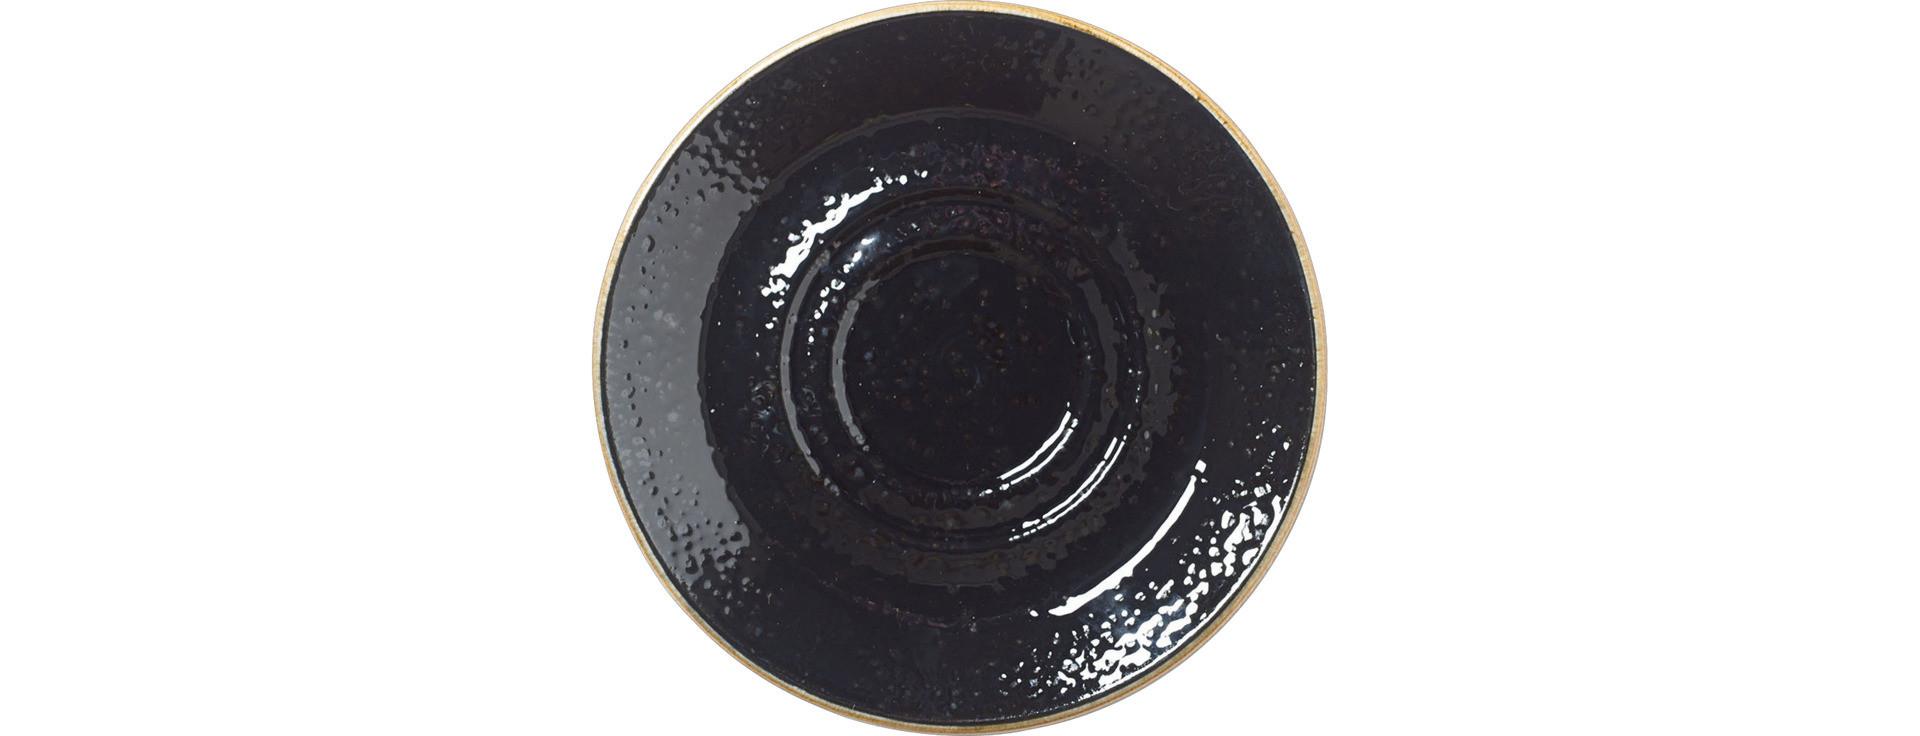 Craft Liquorice, Kombi-Untertasse ø 145 mm